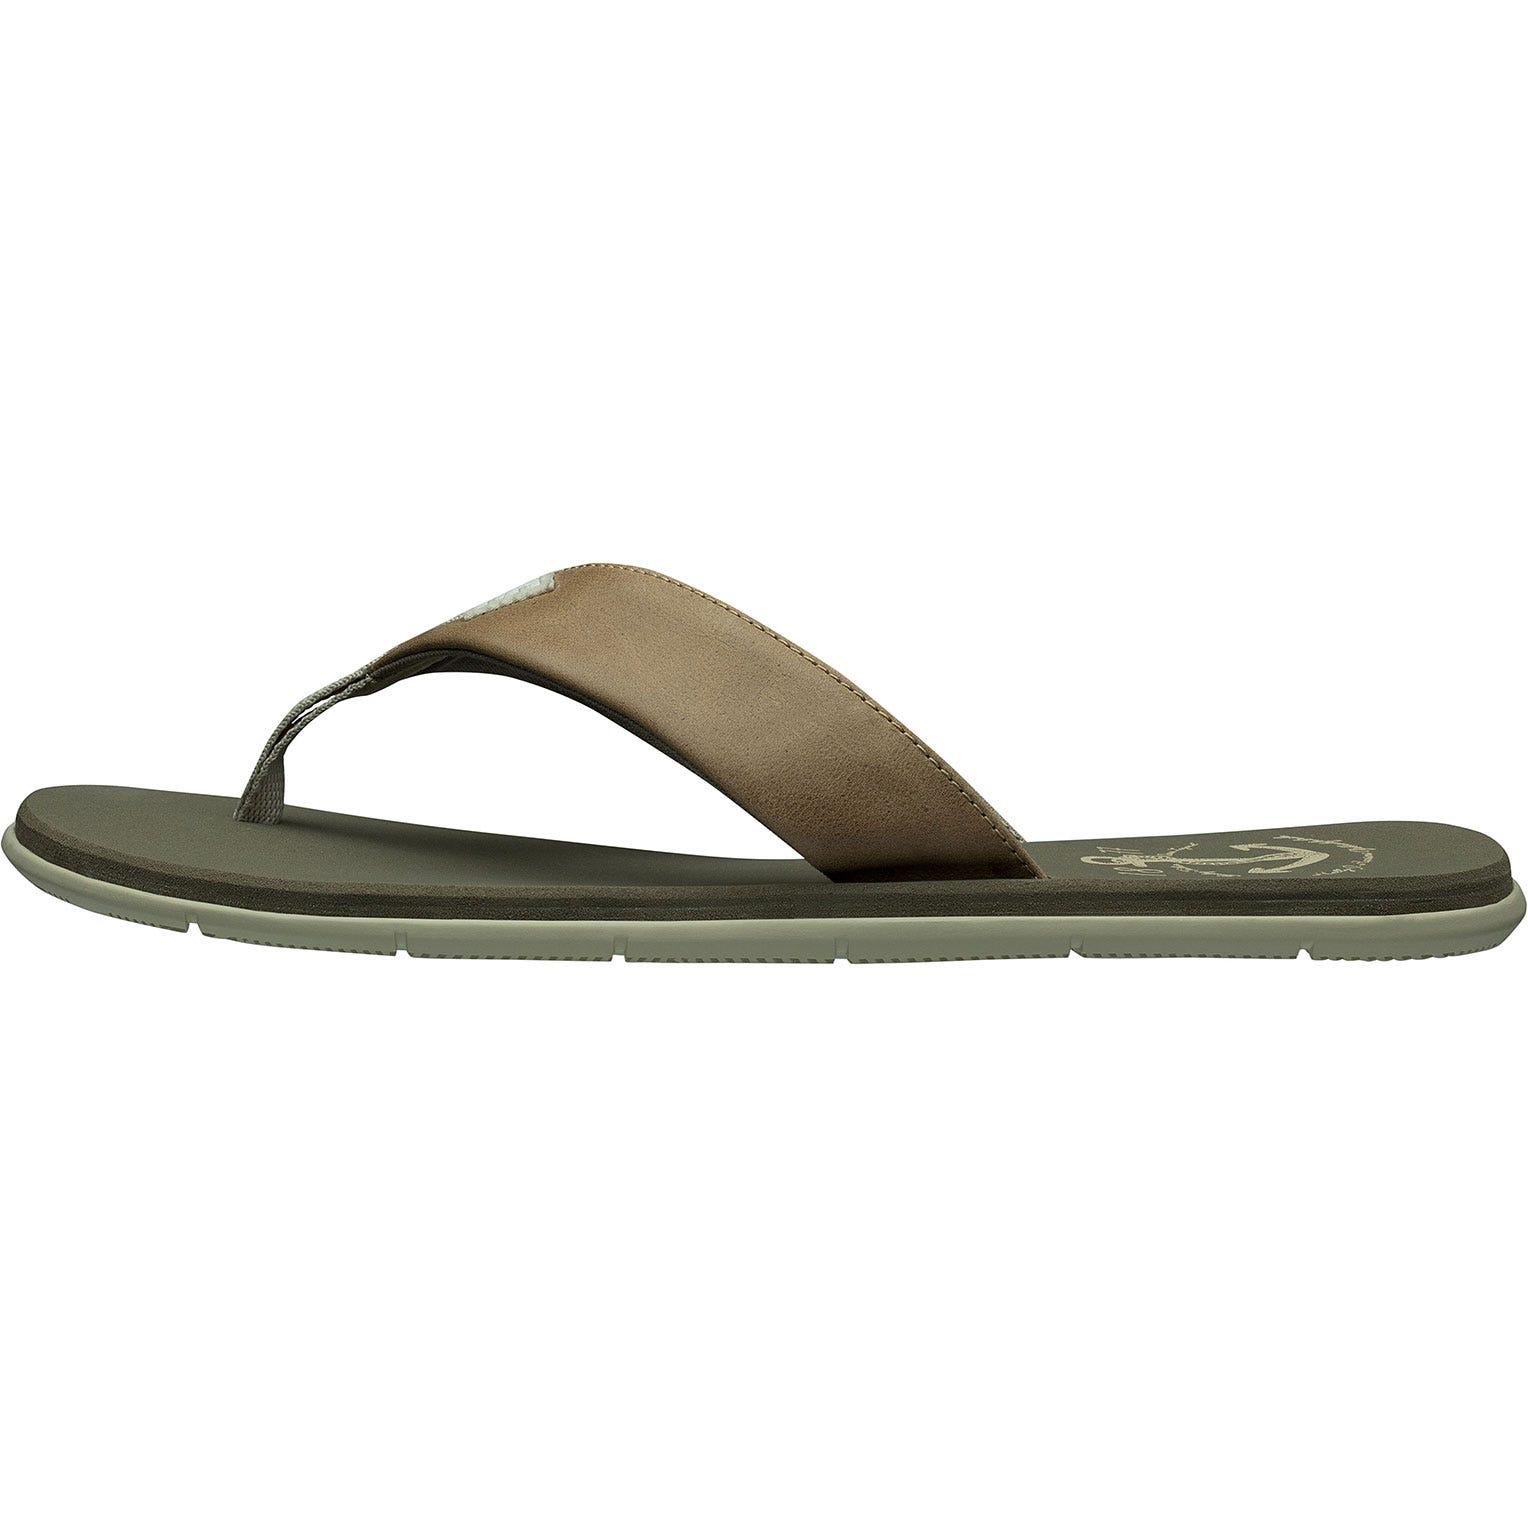 Helly Hansen Seasand Leather Sandal Mens Beige 41/8